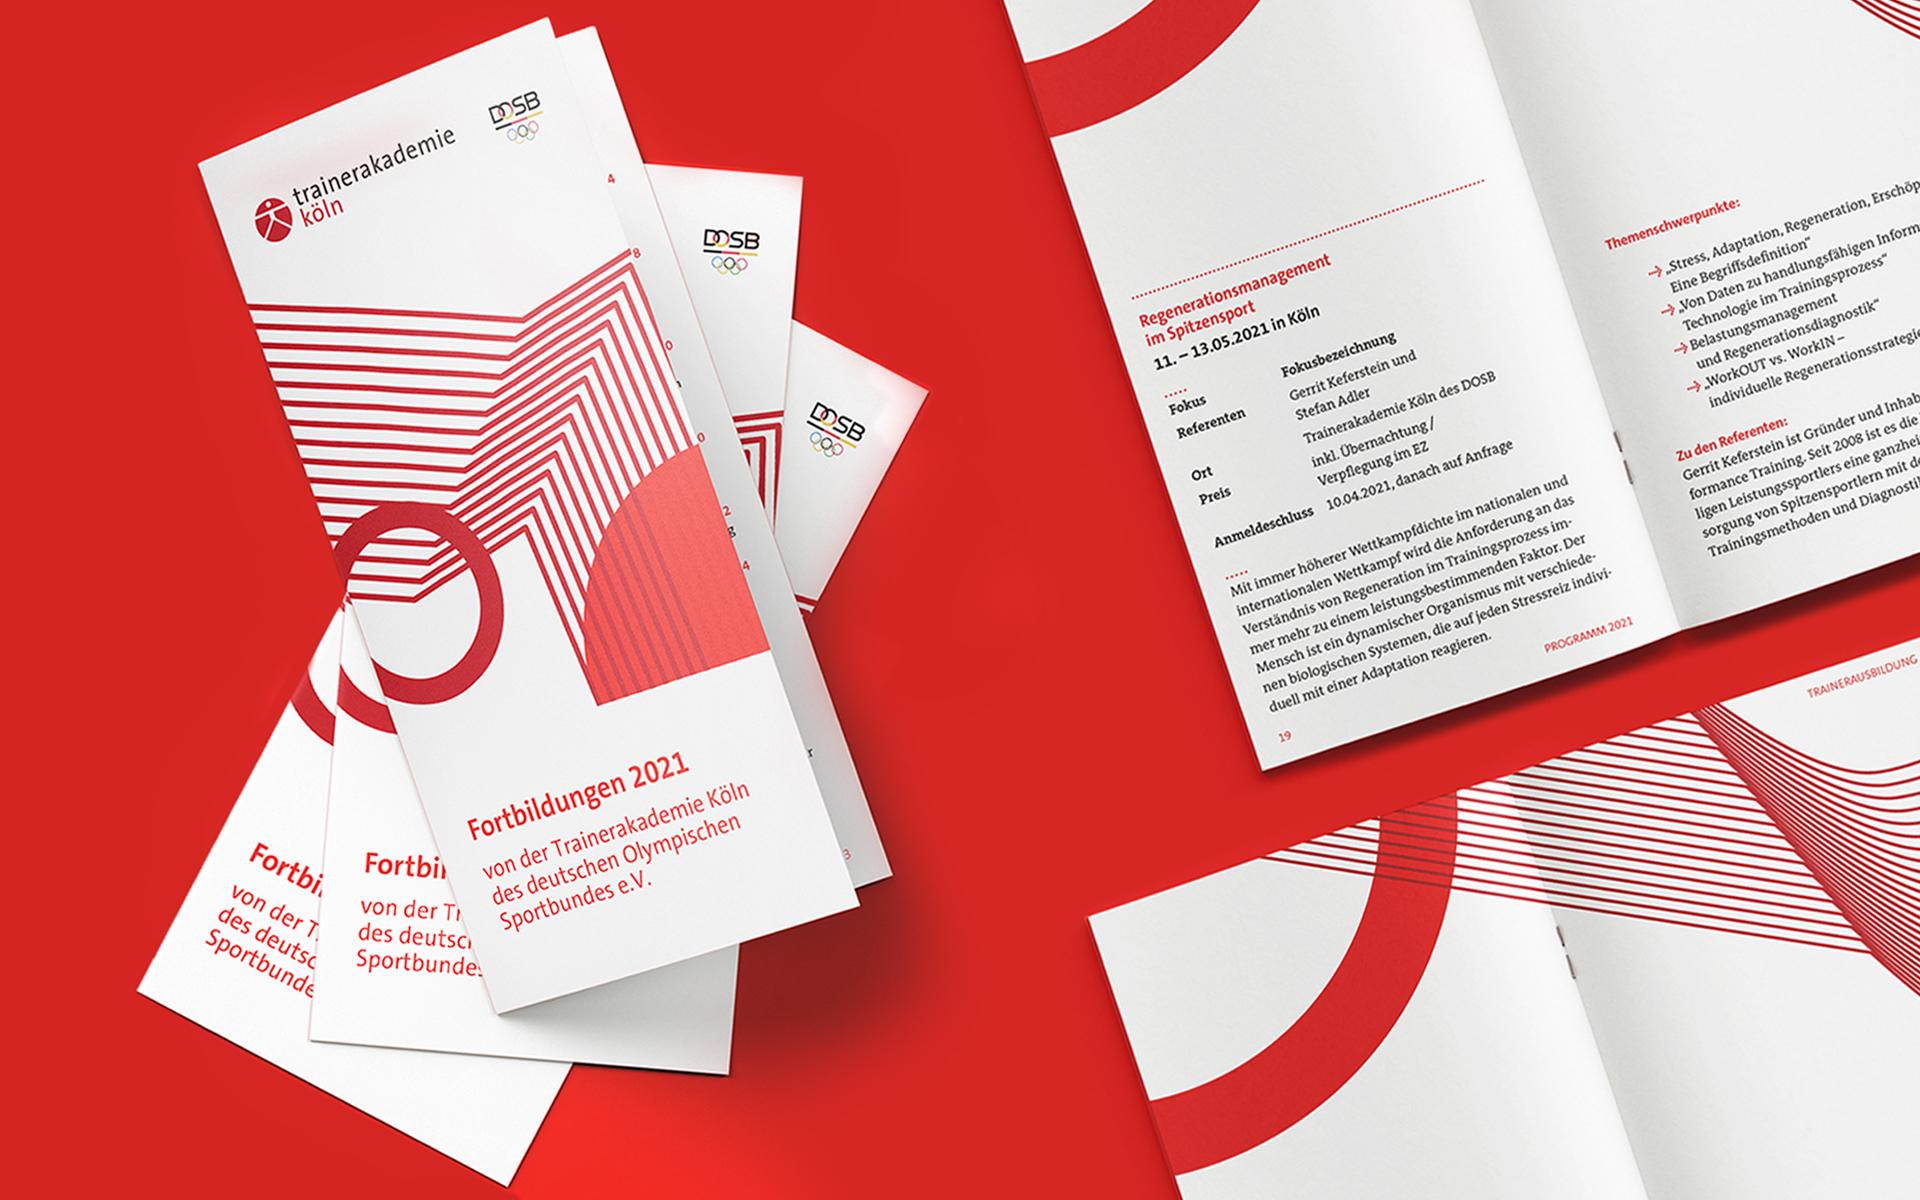 Trainerakademie Köln Corporate Design, Broschürengestaltung